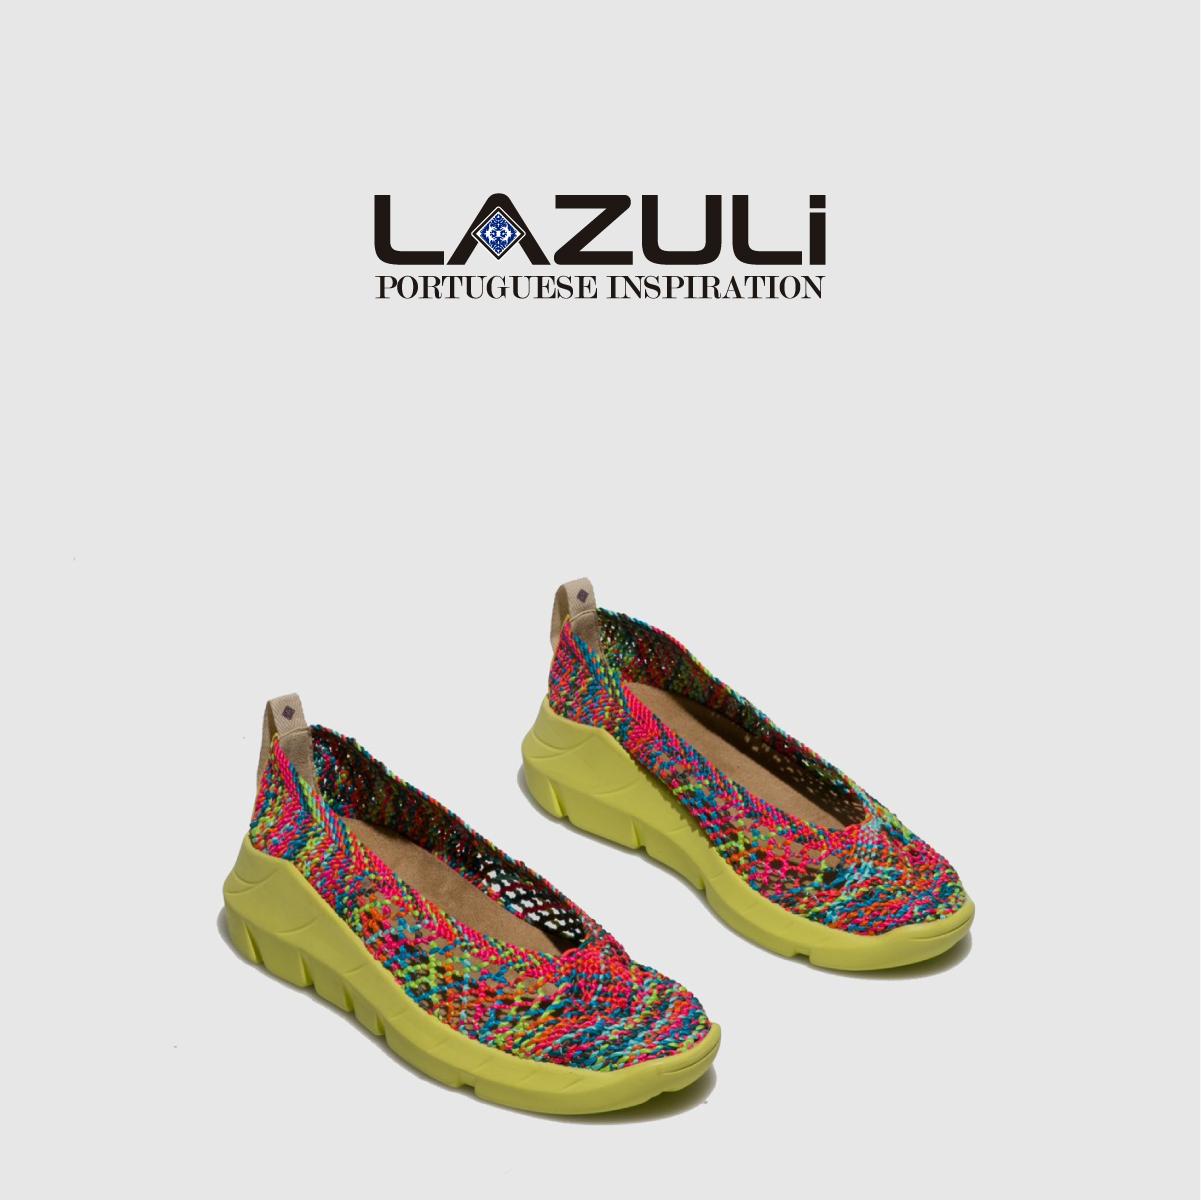 Enjoy Color 🌈💛  #Vegan & #sustainability 🌱     #SpringSummer #SS20 #ss2029 #PrimaveraVerao2020 #Sandals #Footwear #Shoes #ShoeLover #sapatos #PortugueseShoes #PortugueseInspiration #PortugueseTiles  #Lazuli #LazuliShoes #MyLazuli